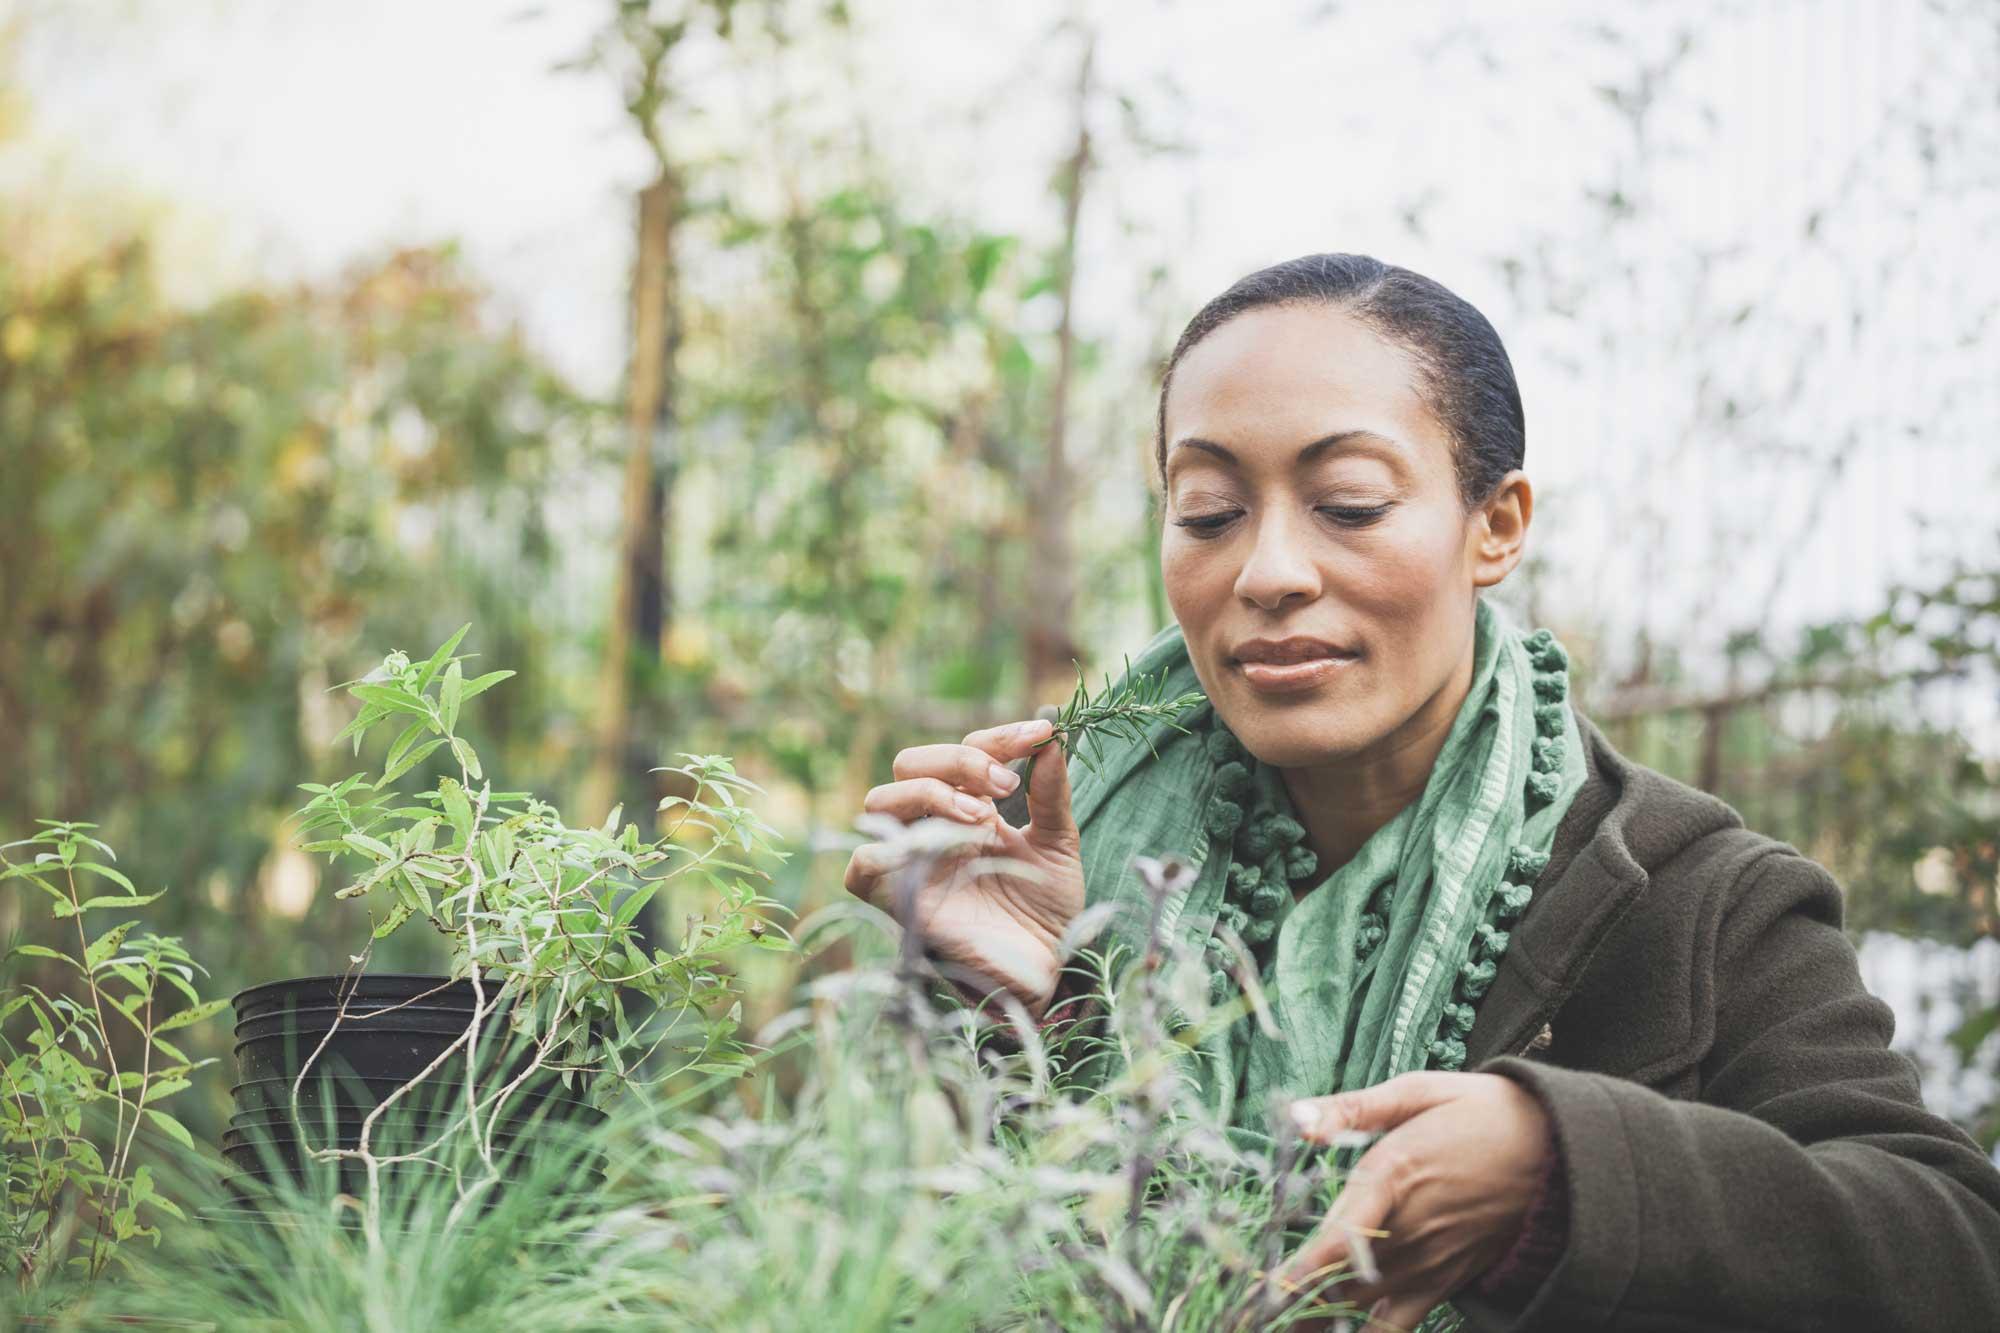 woman working in an urban garden